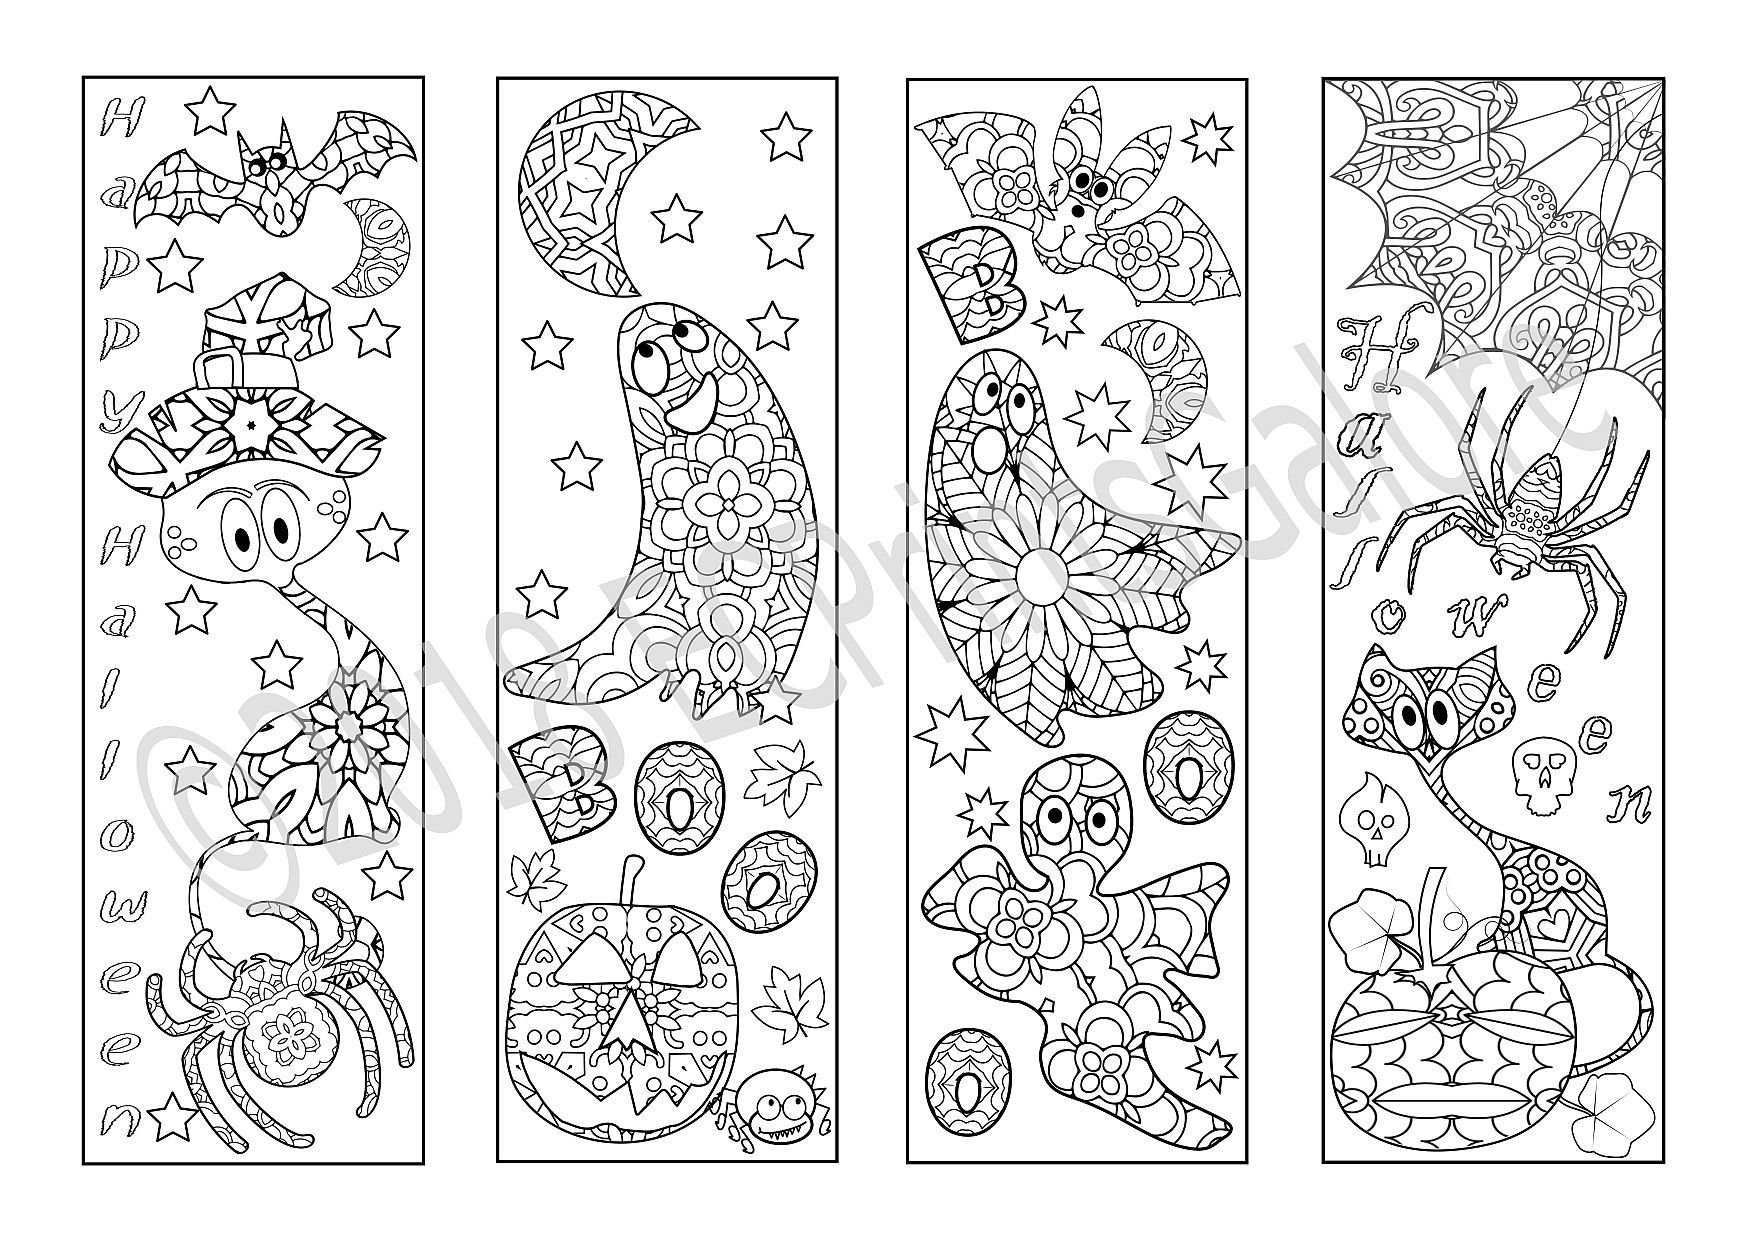 Halloween Coloring Bookmarks Printable Halloween Bookmarks Pdf Coloring Bookmarks Halloween Coloring Halloween Coloring Pages